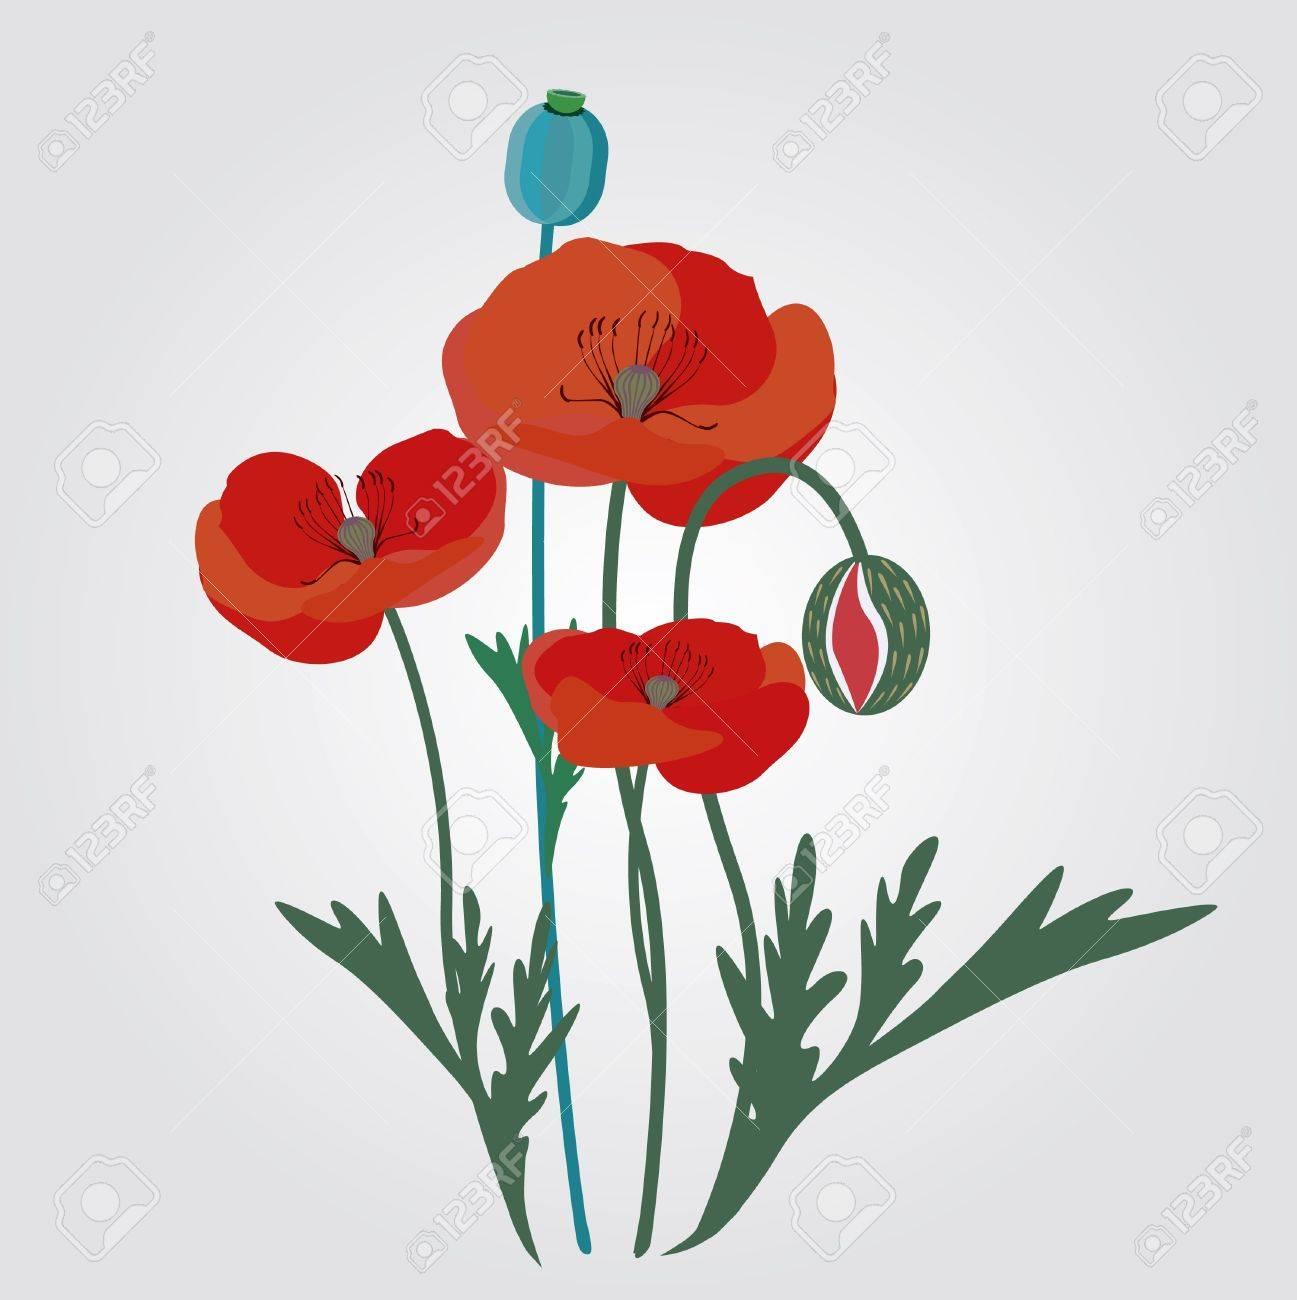 Red poppy flowers illustration royalty free cliparts vectors and red poppy flowers illustration stock vector 18568558 mightylinksfo